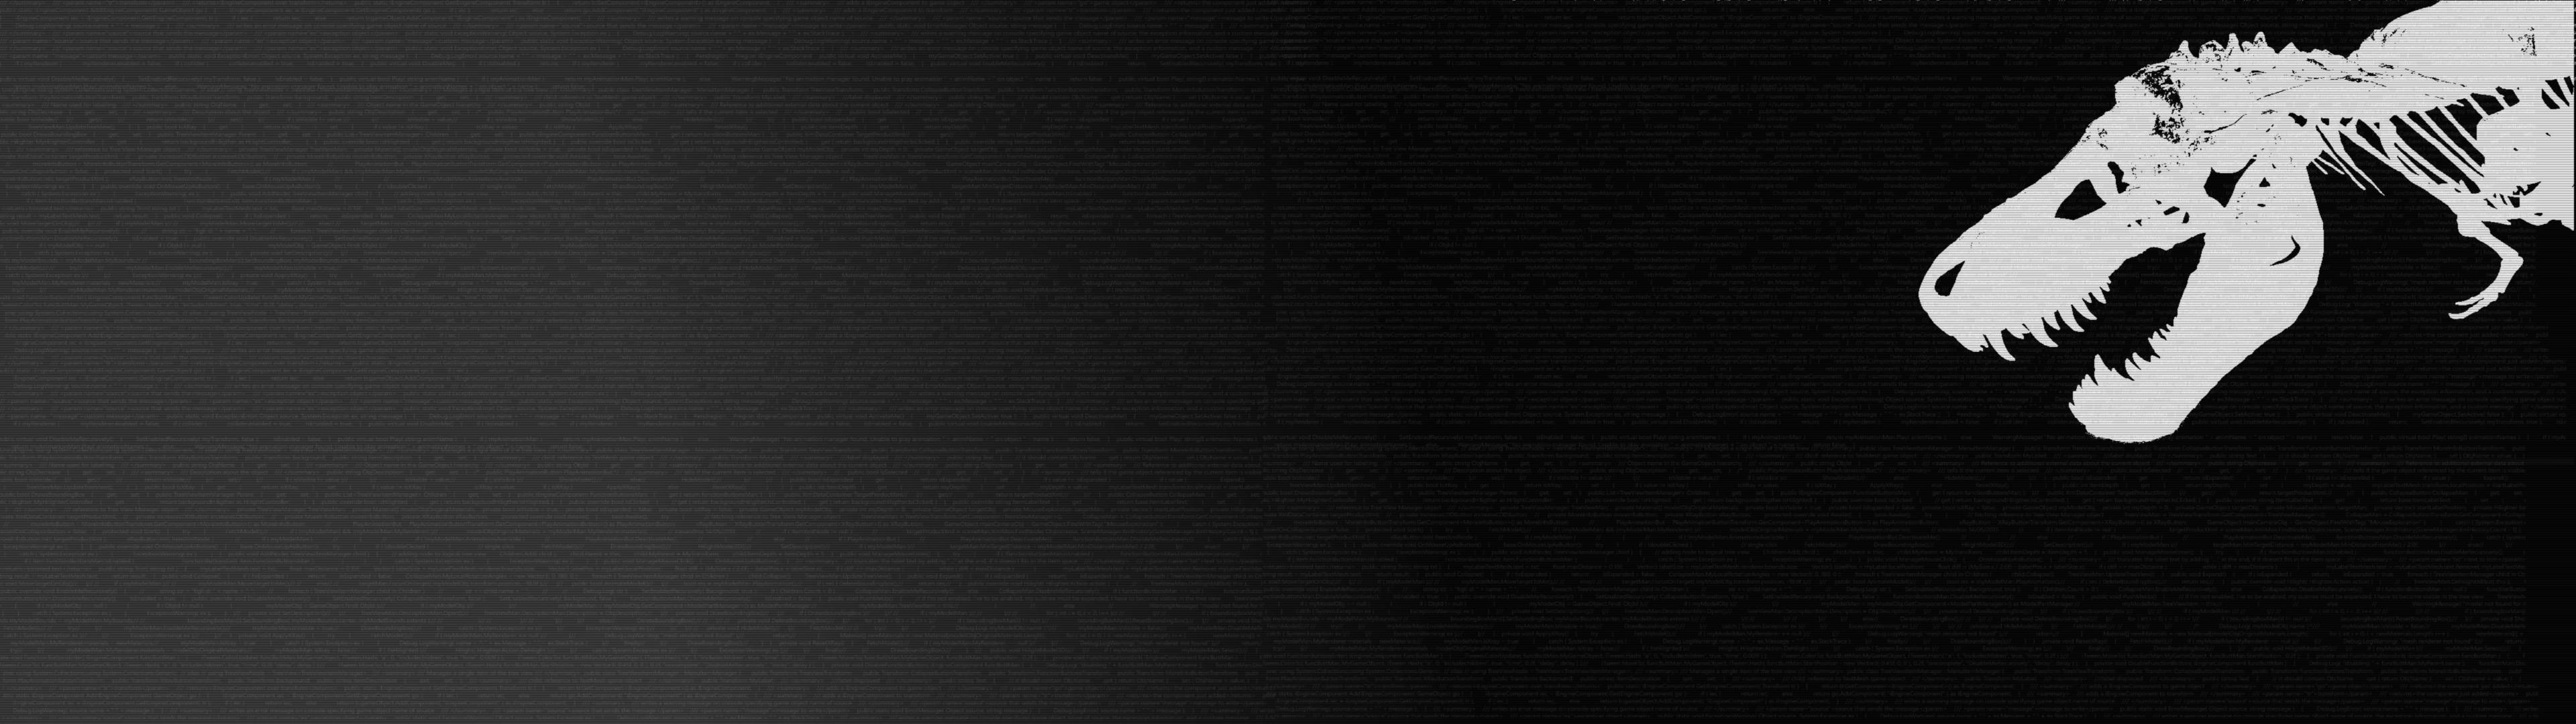 Res: 3840x1080, ... Roger Wallpaper double-screen 3840×1080 (DOUBLE FULL-HD) for desktop ...